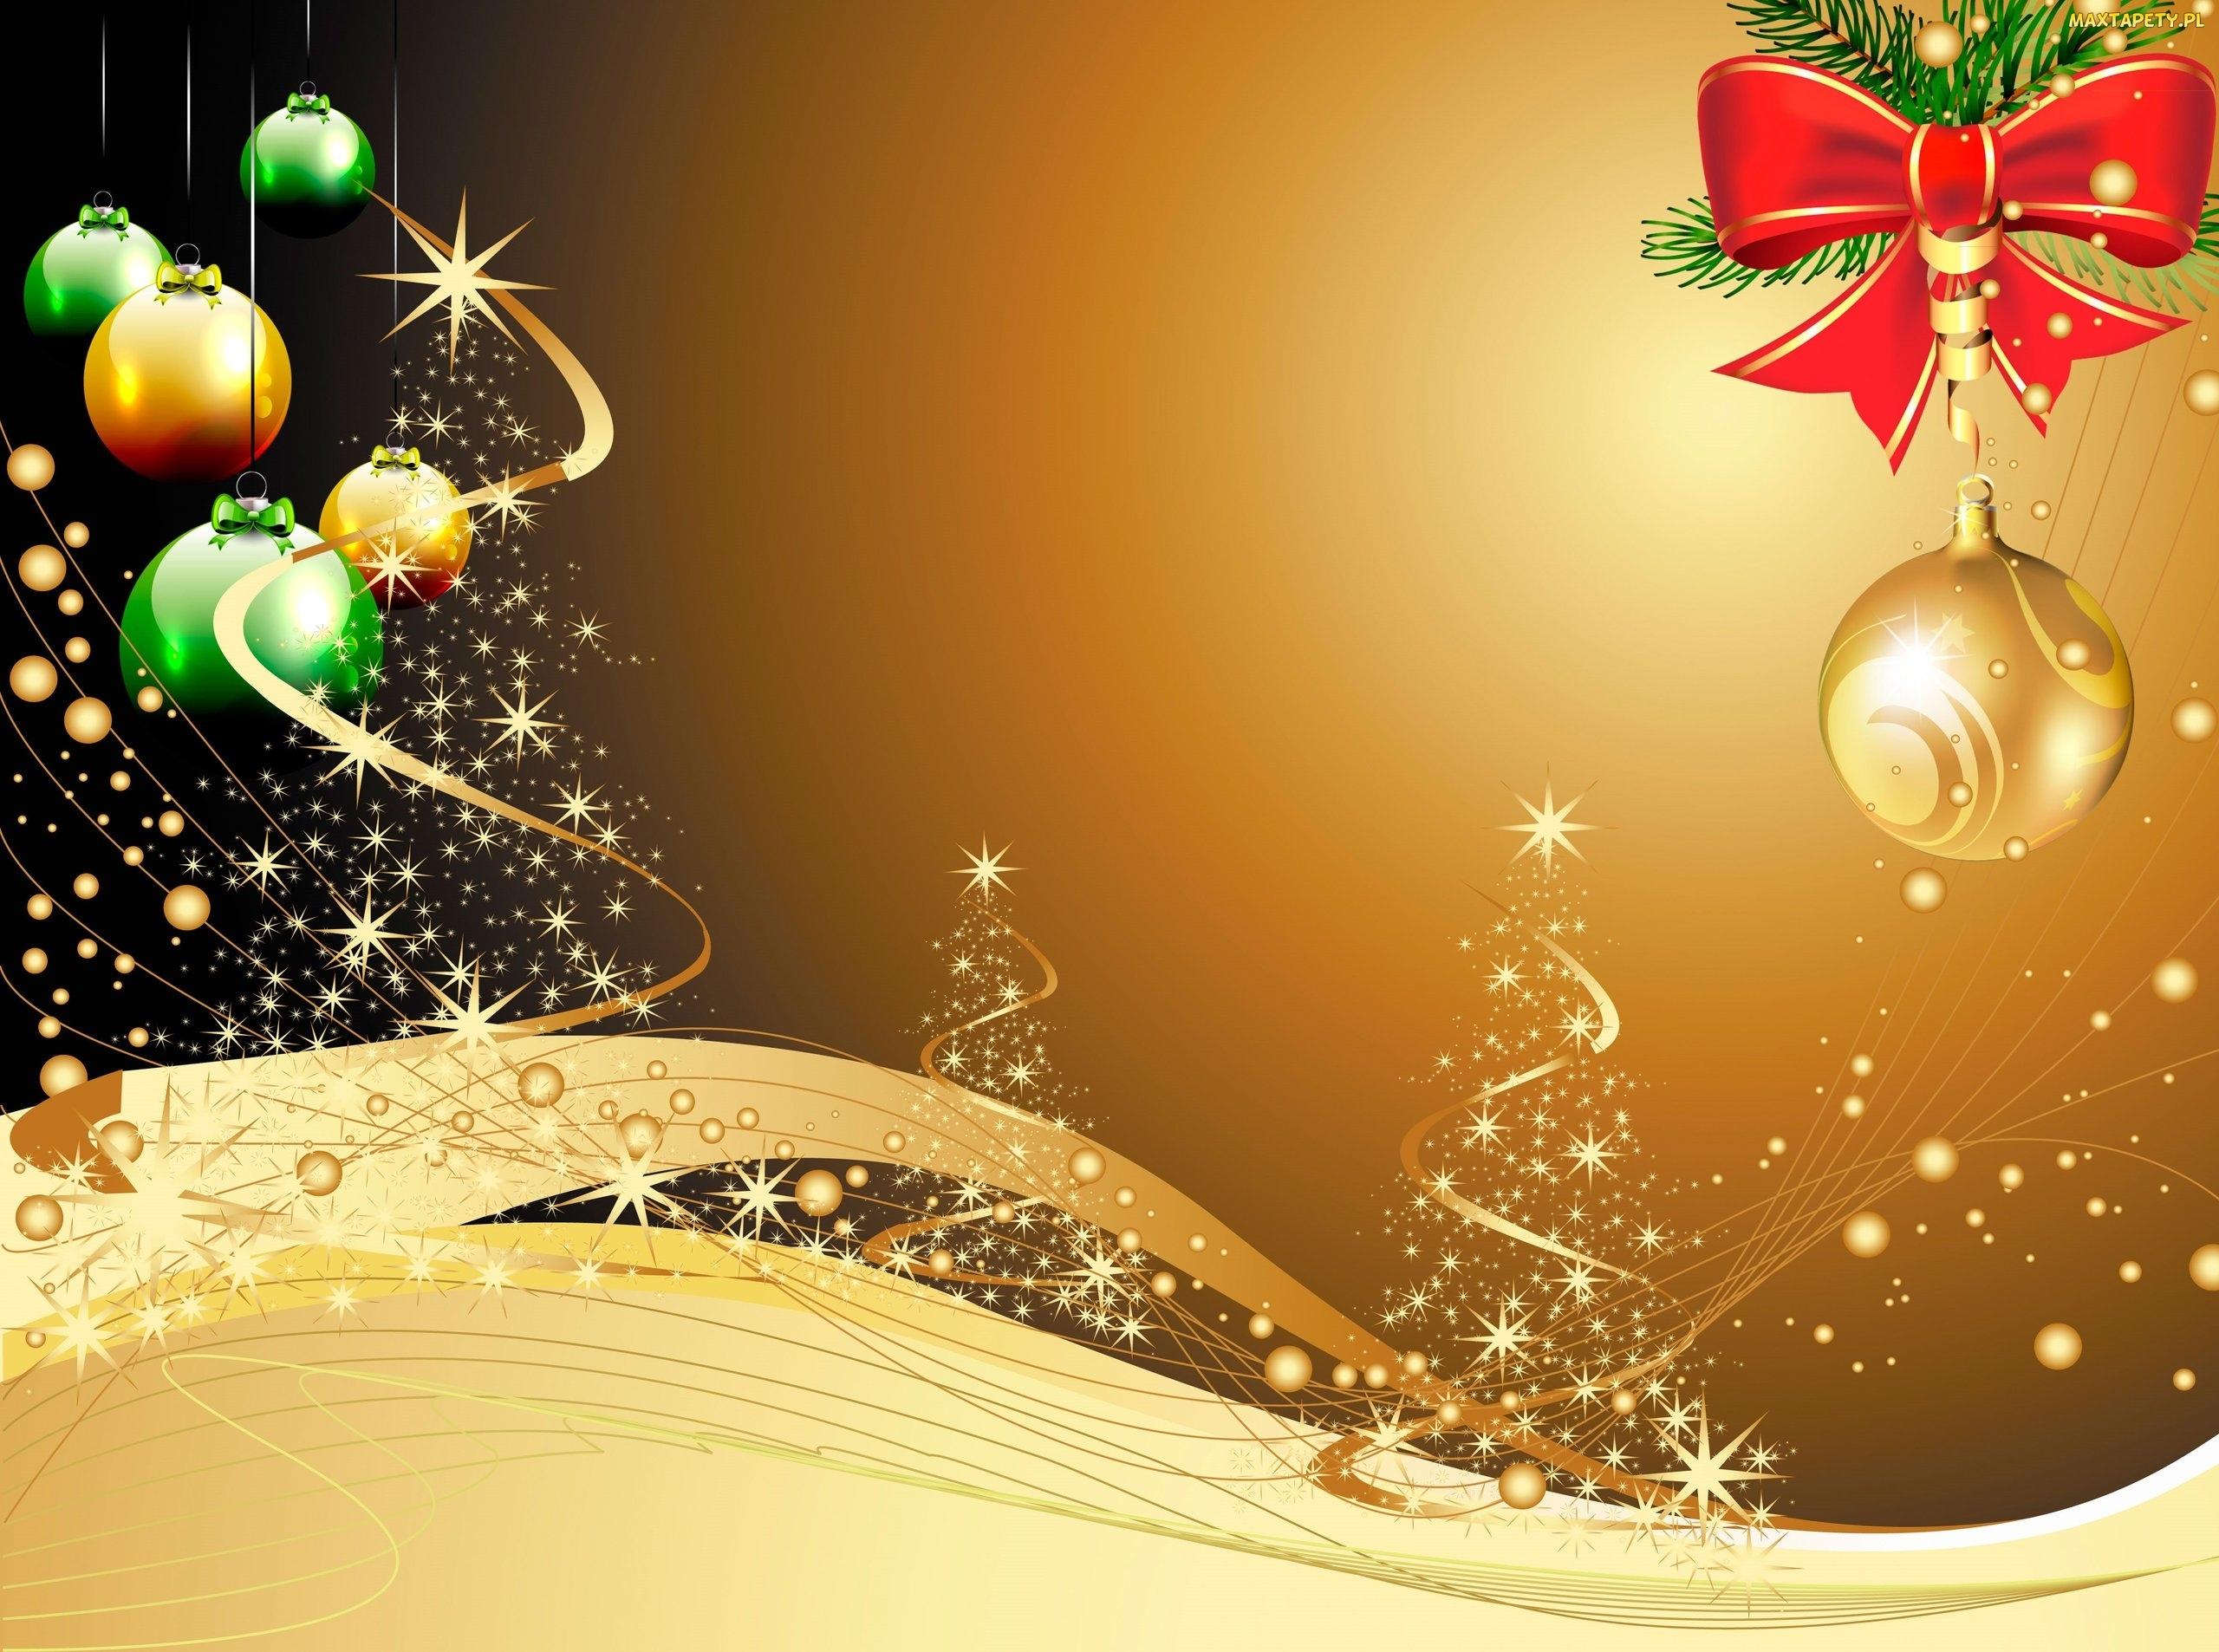 Tapety zdj cia grafika 2d kokardka bombki bo e for Natale immagini per desktop